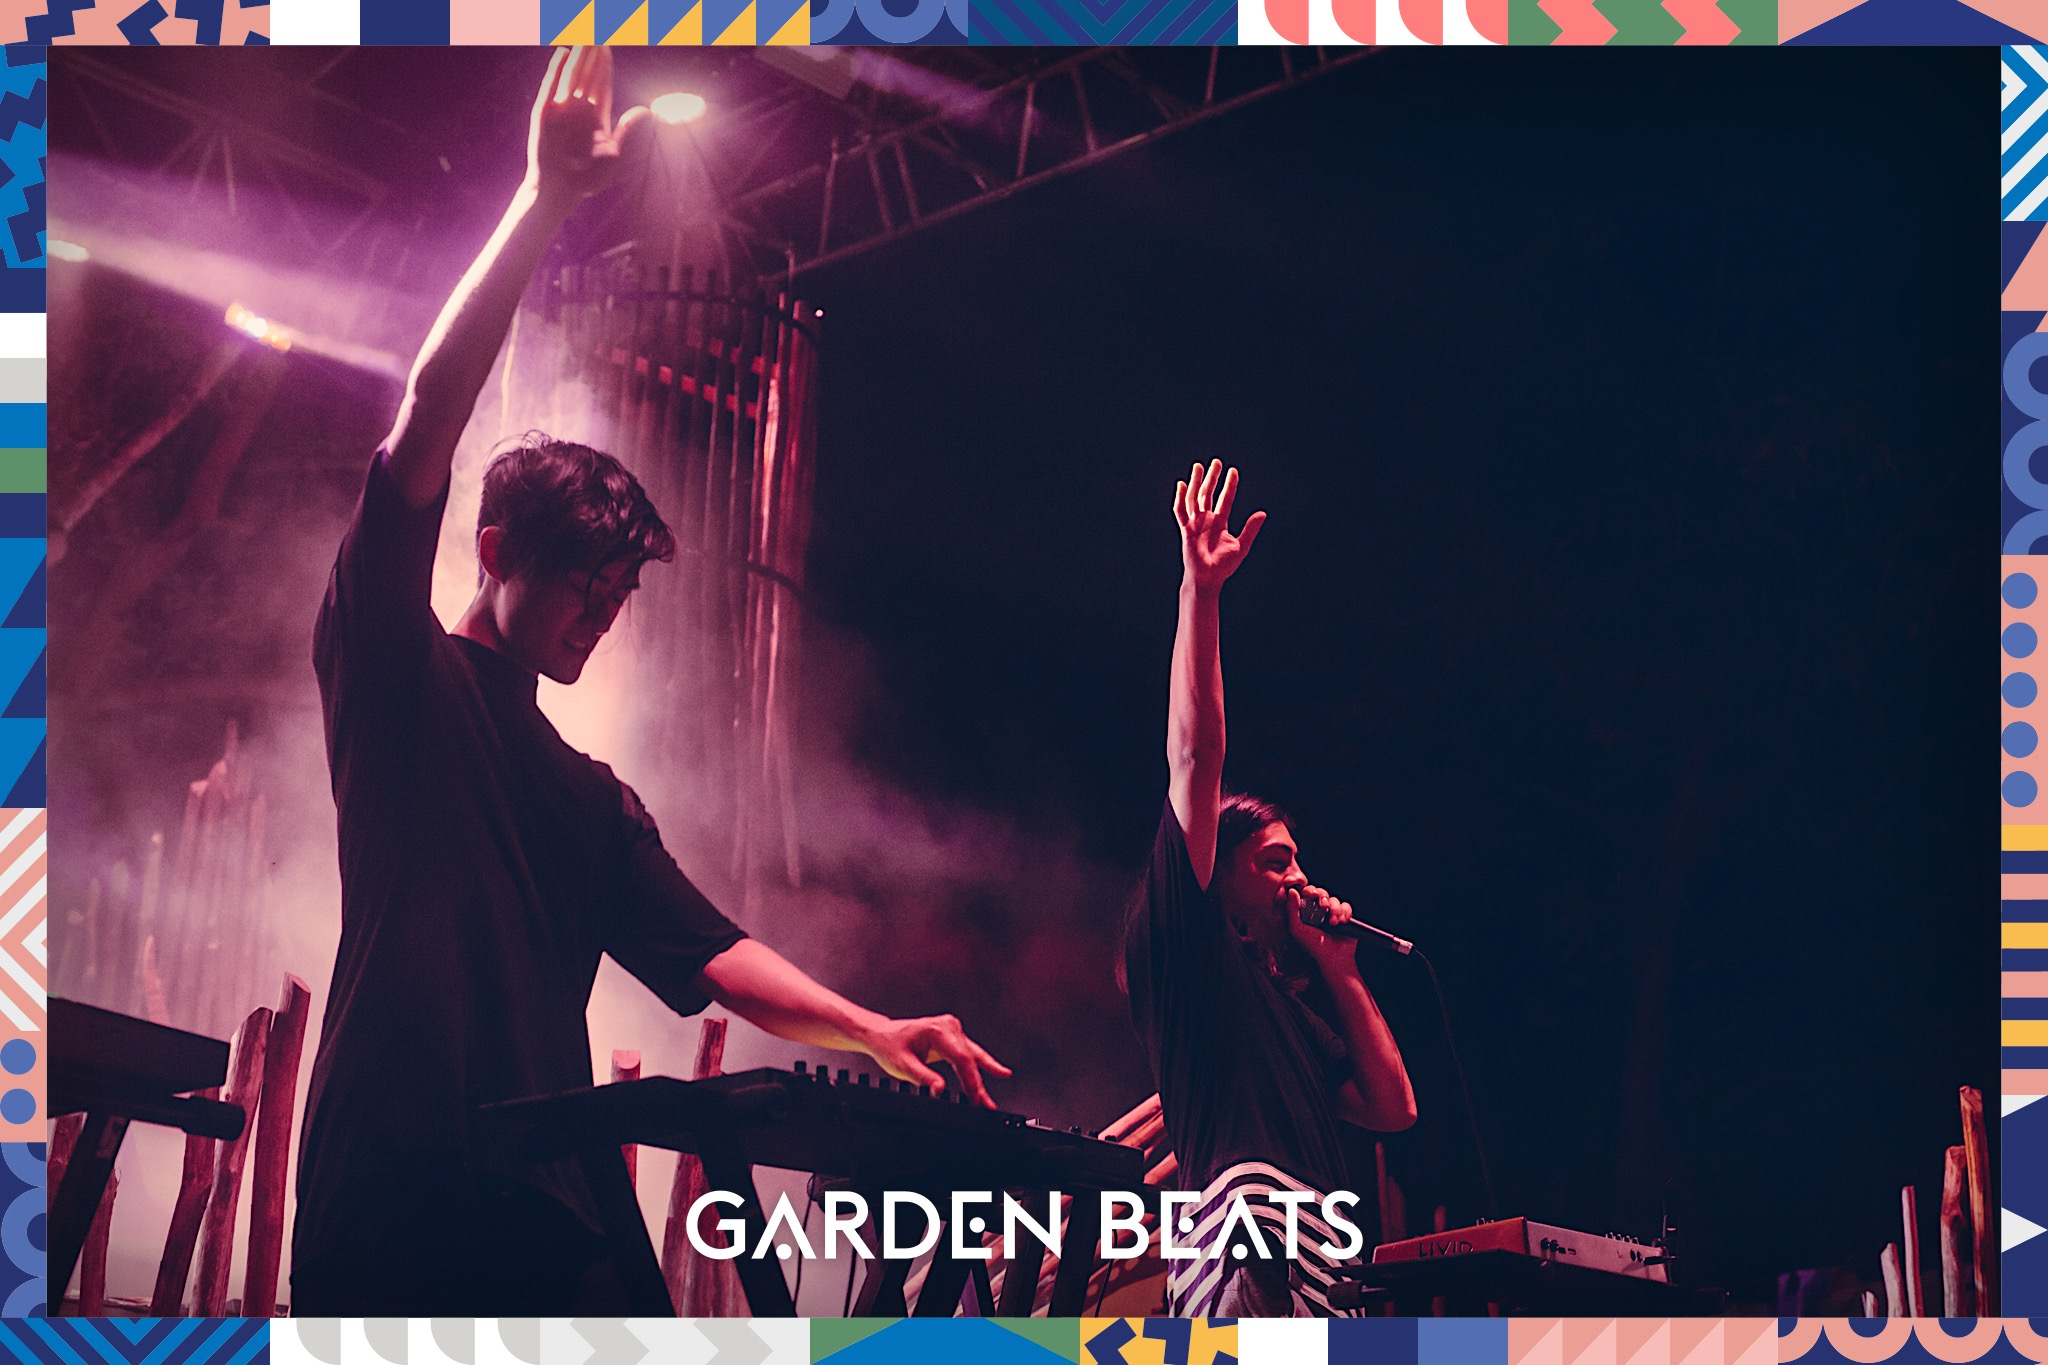 18032017_GardenBeats_Colossal729_WatermarkedGB.jpg